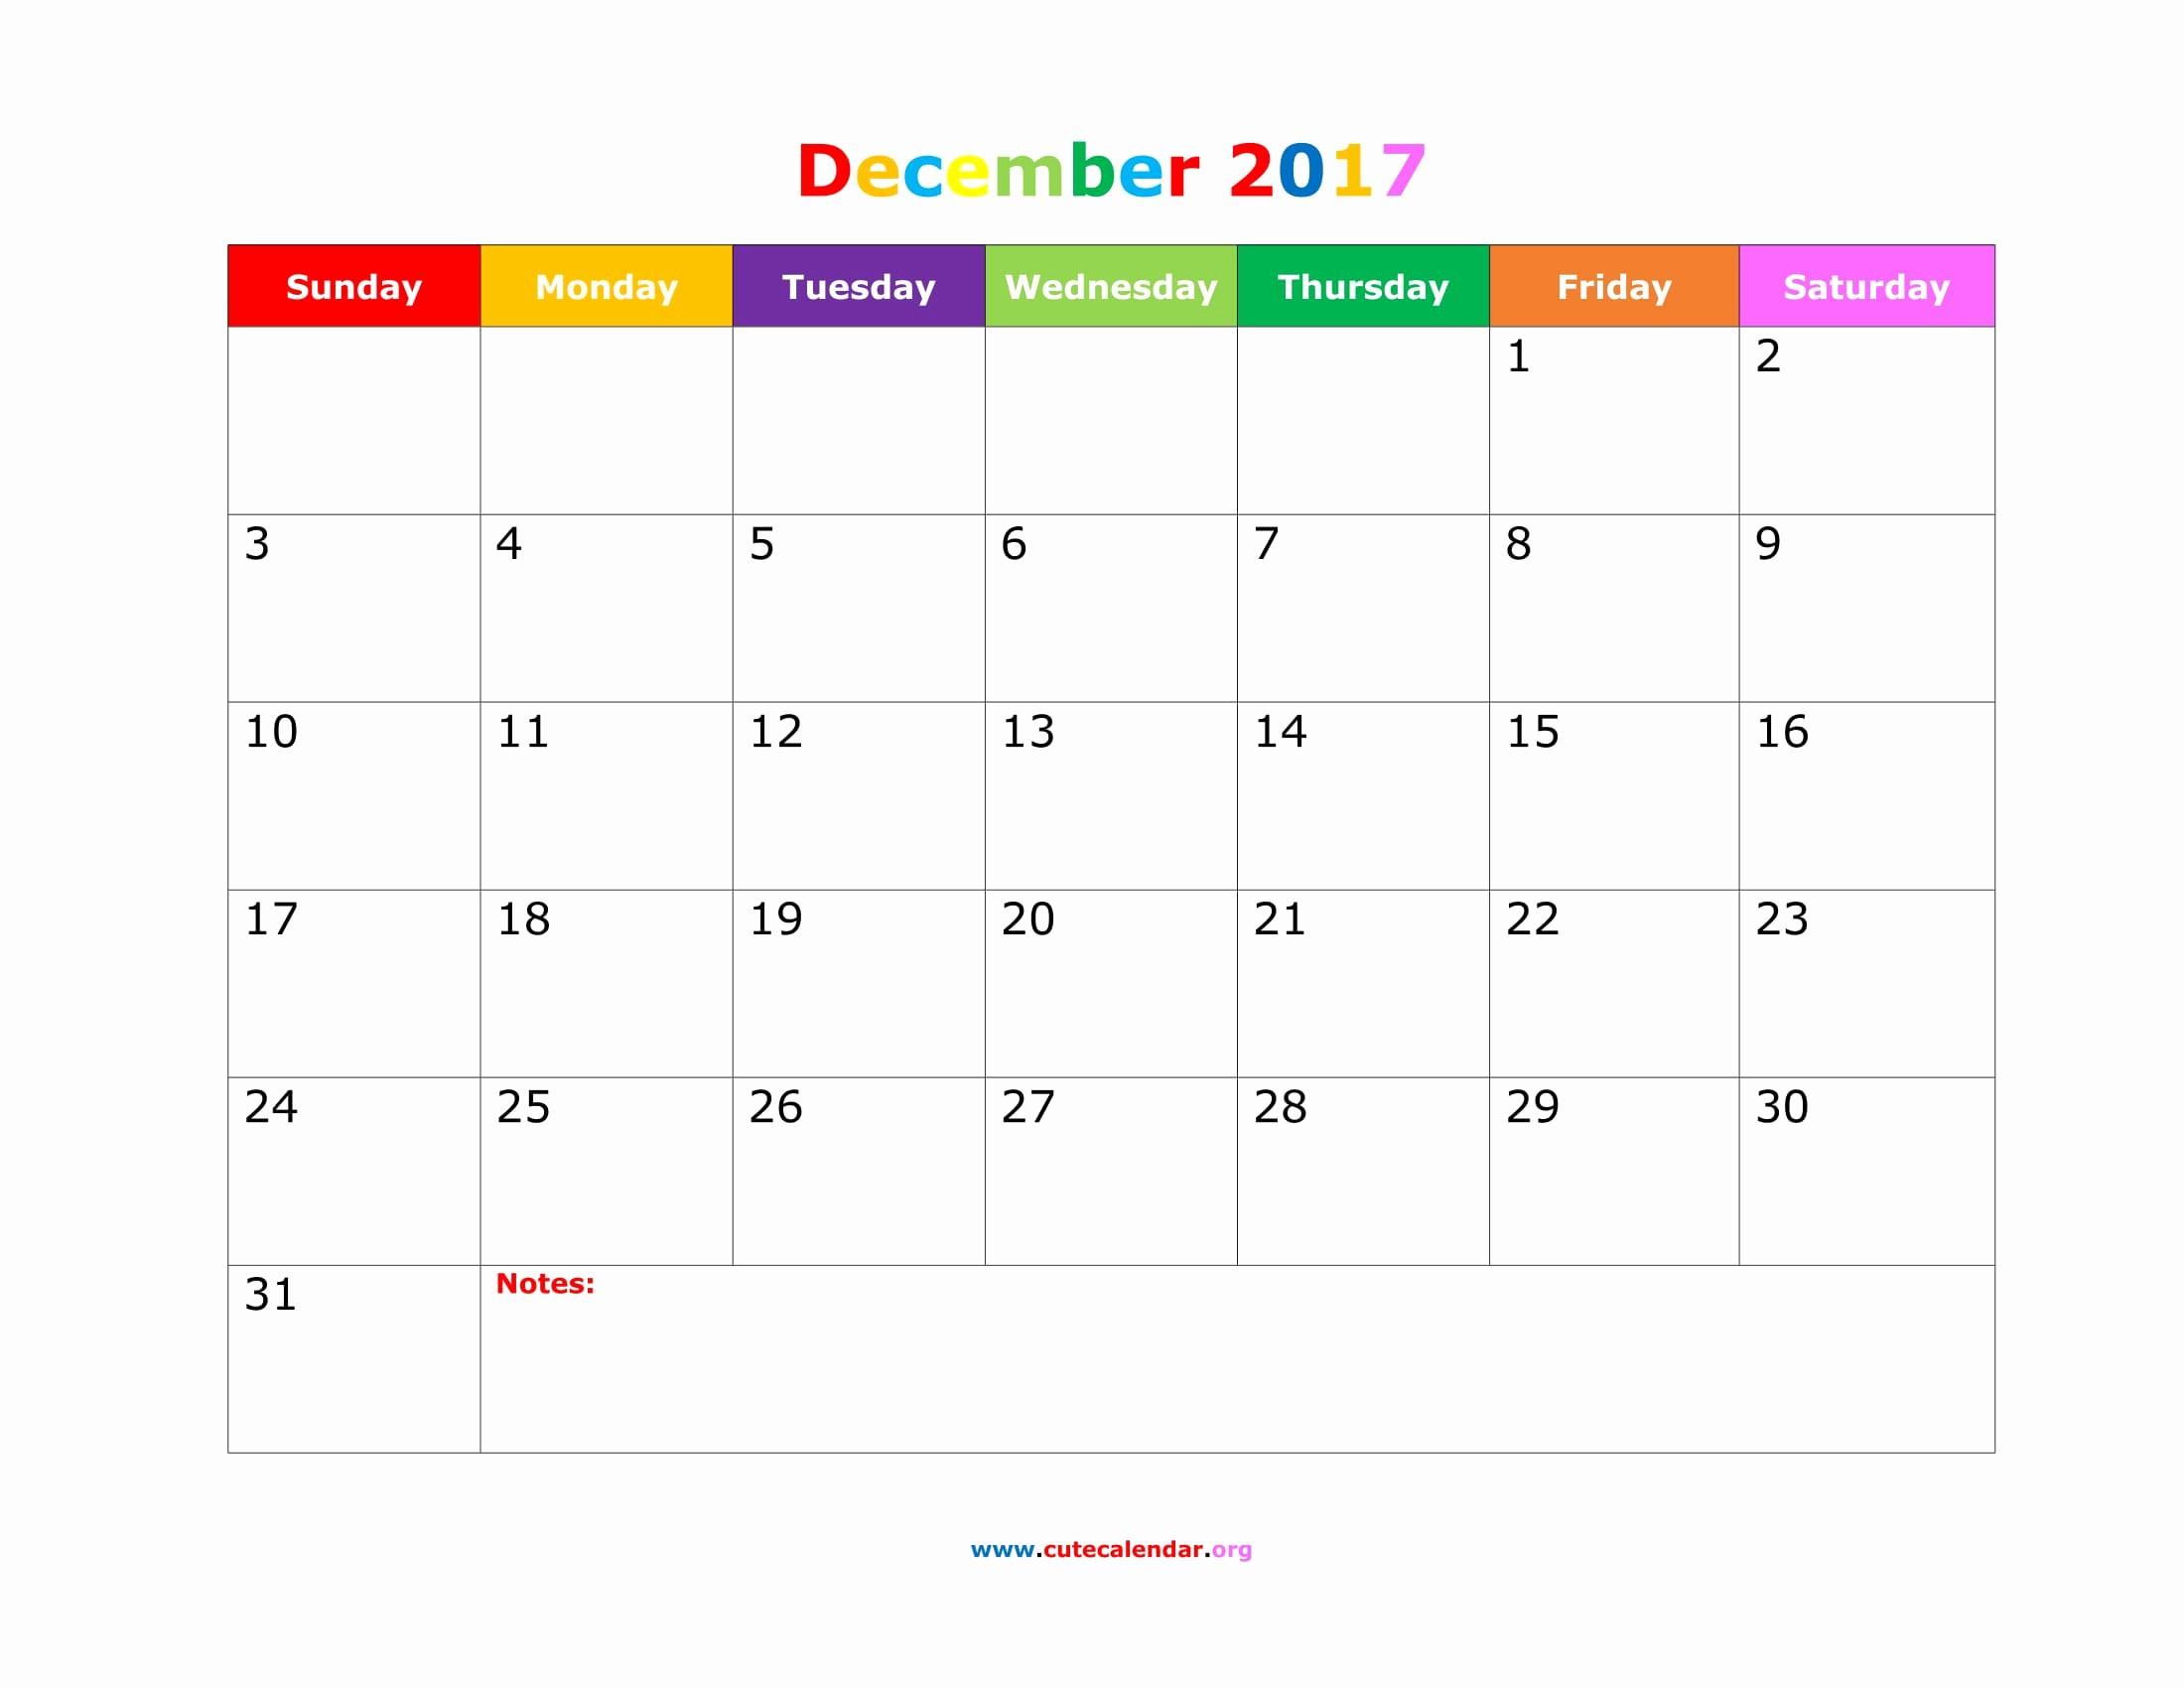 2017 Calendar Template with Notes Lovely December 2017 Calendar Cute